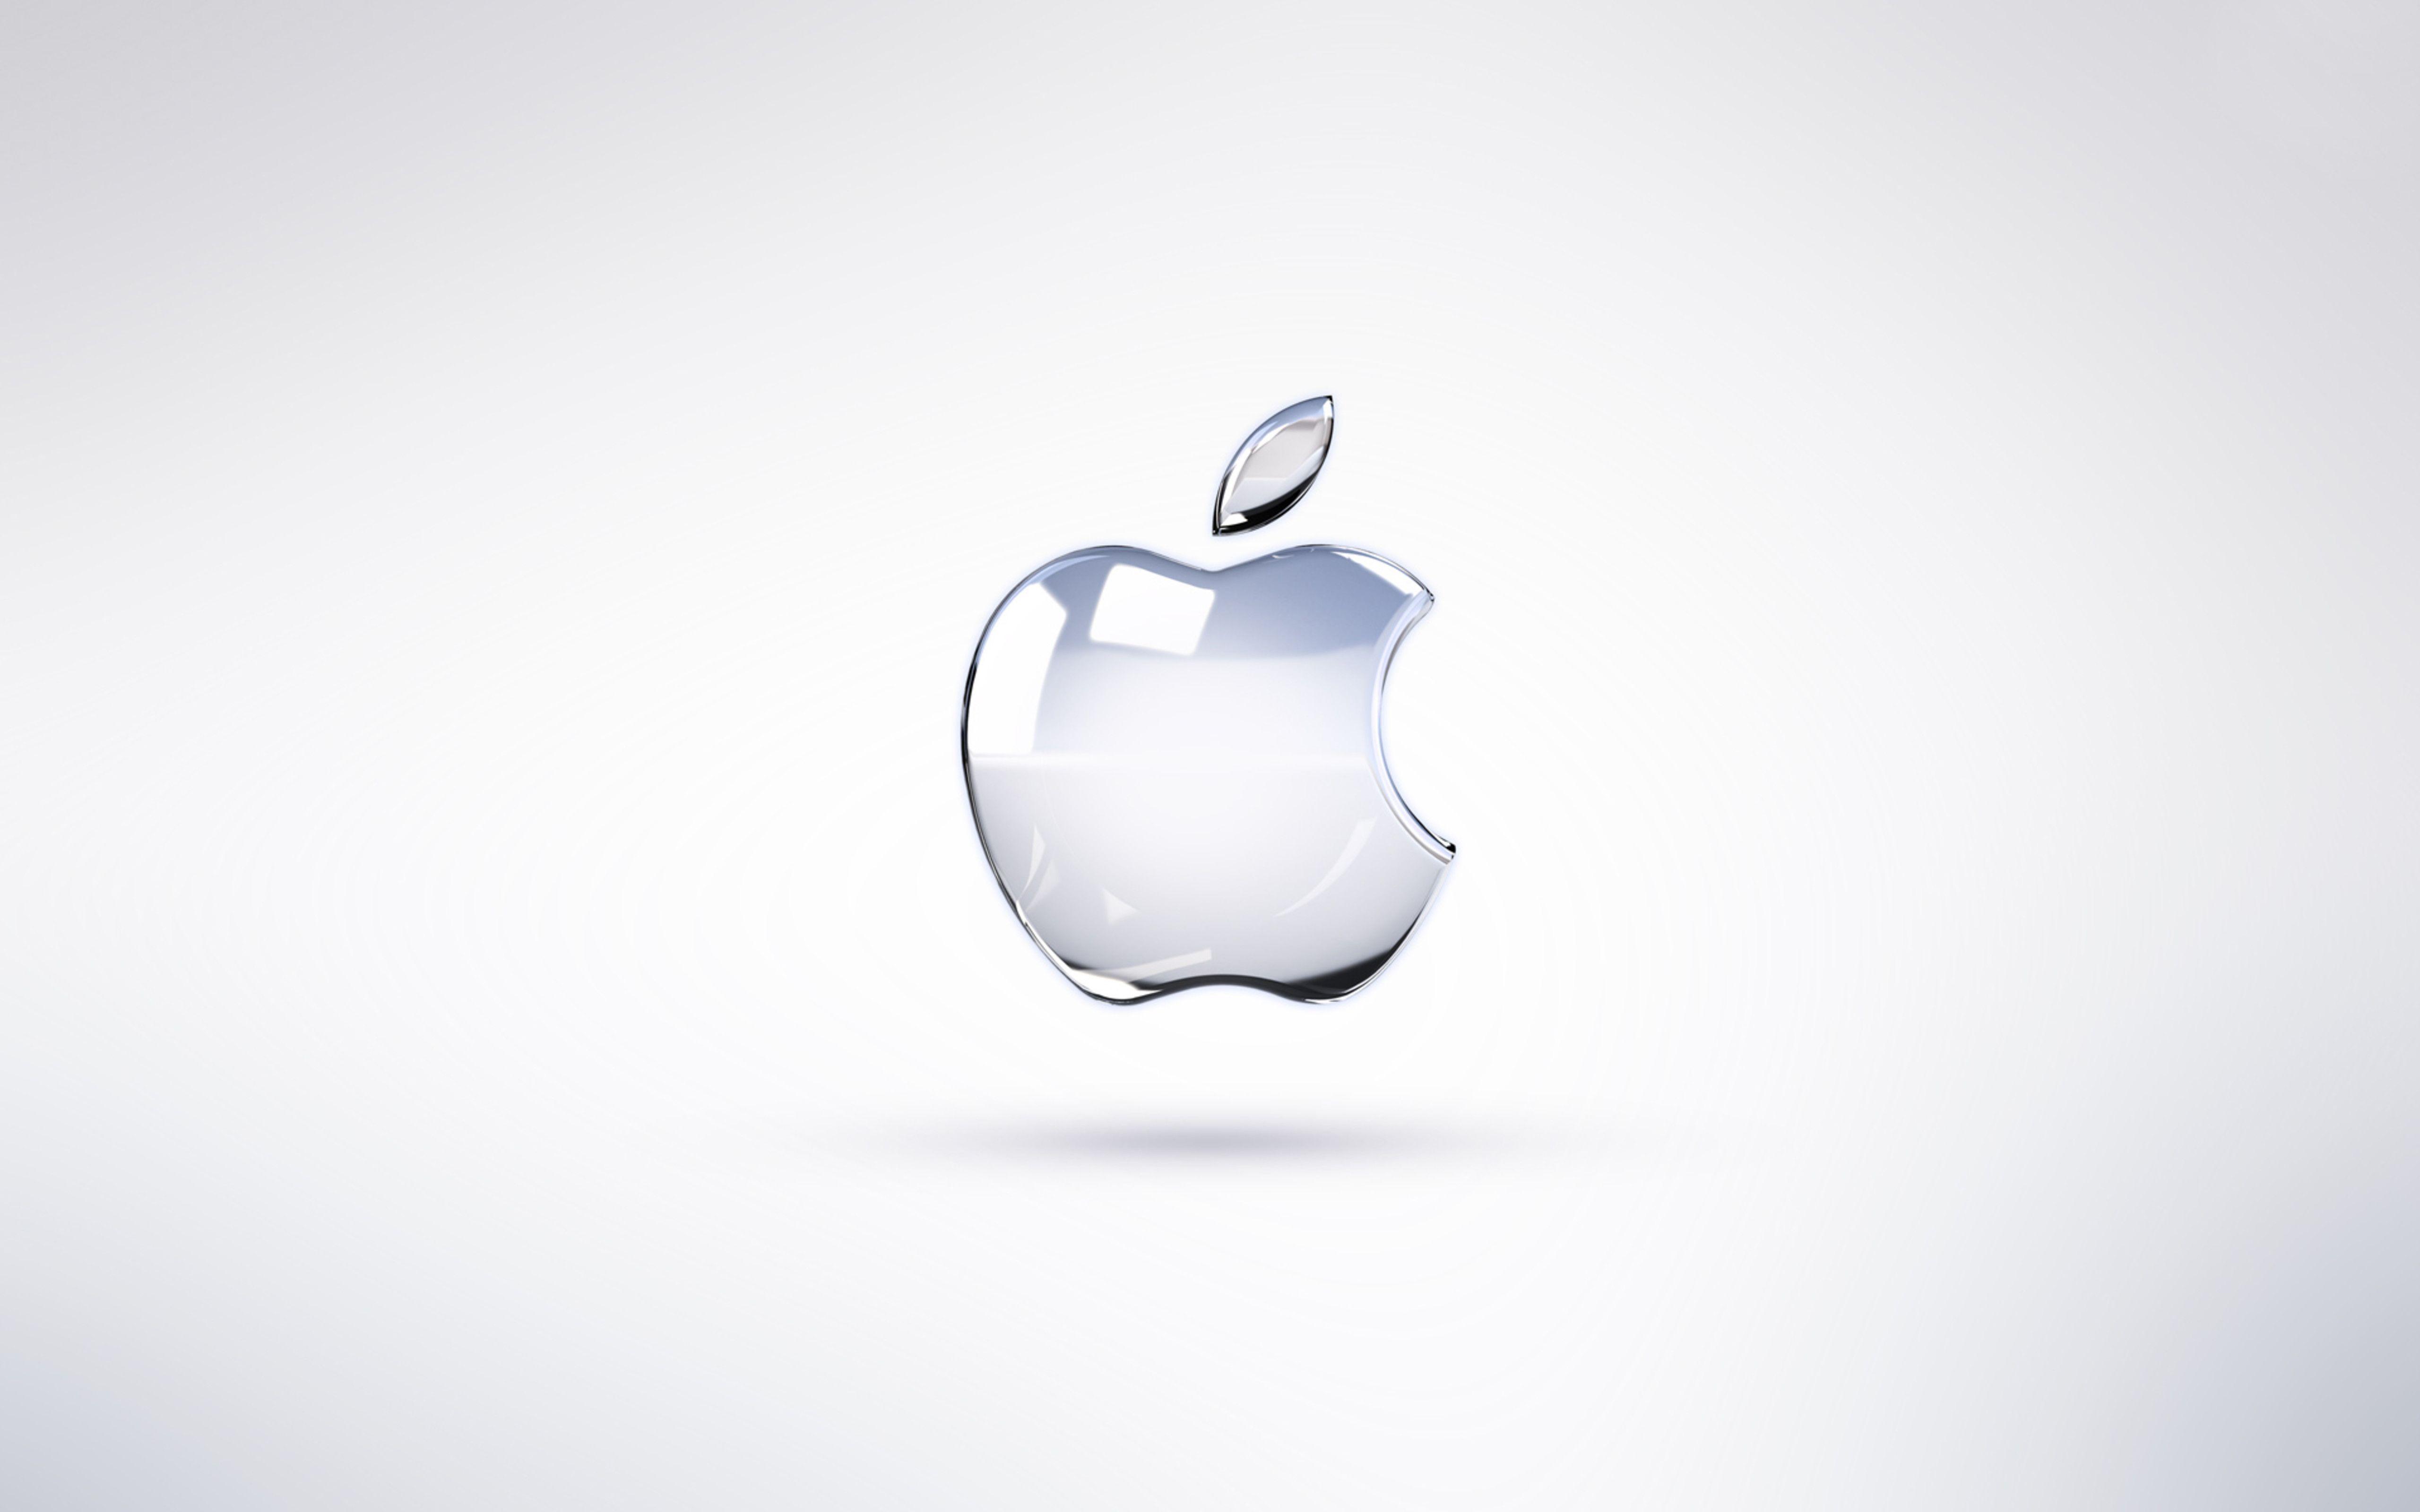 Wallpaper Download 5120x3200 Shiny Silver Apple Logo Apple Mac Hd Wallpapers Computer Wallpape Apple Logo Wallpaper Apple Wallpaper Apple Wallpaper Full Hd